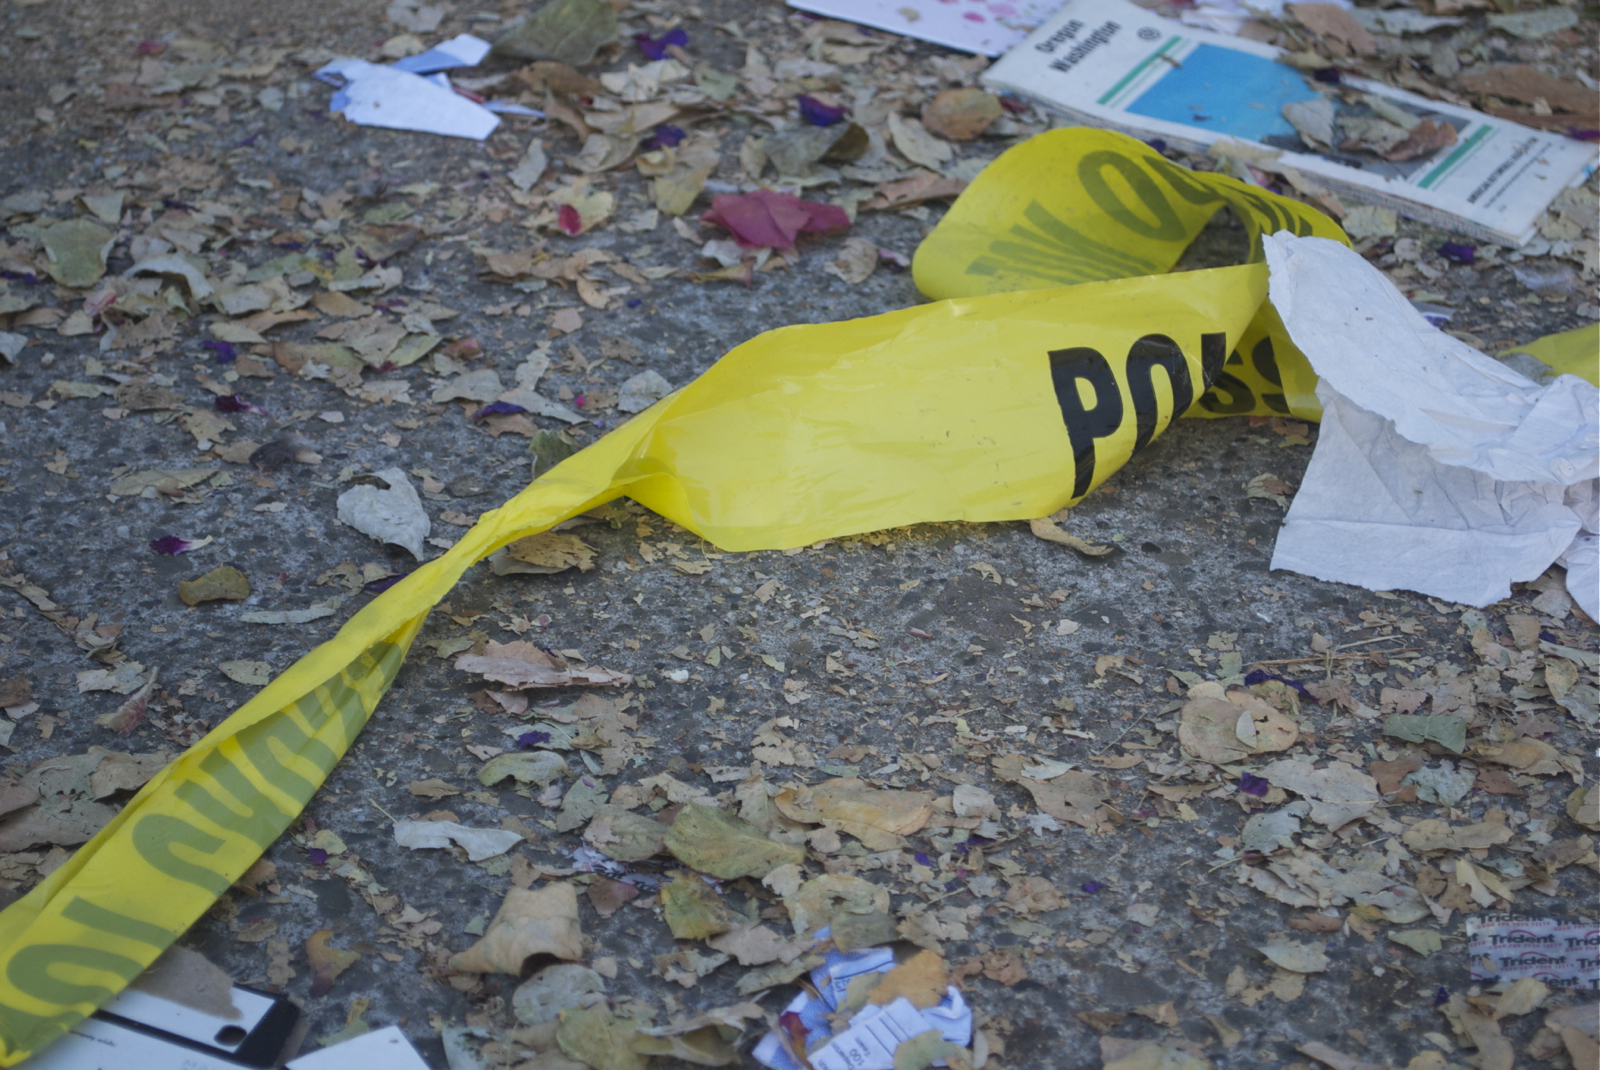 Police Arrest Man in Treat Ave. Murder, Seek Second Suspect